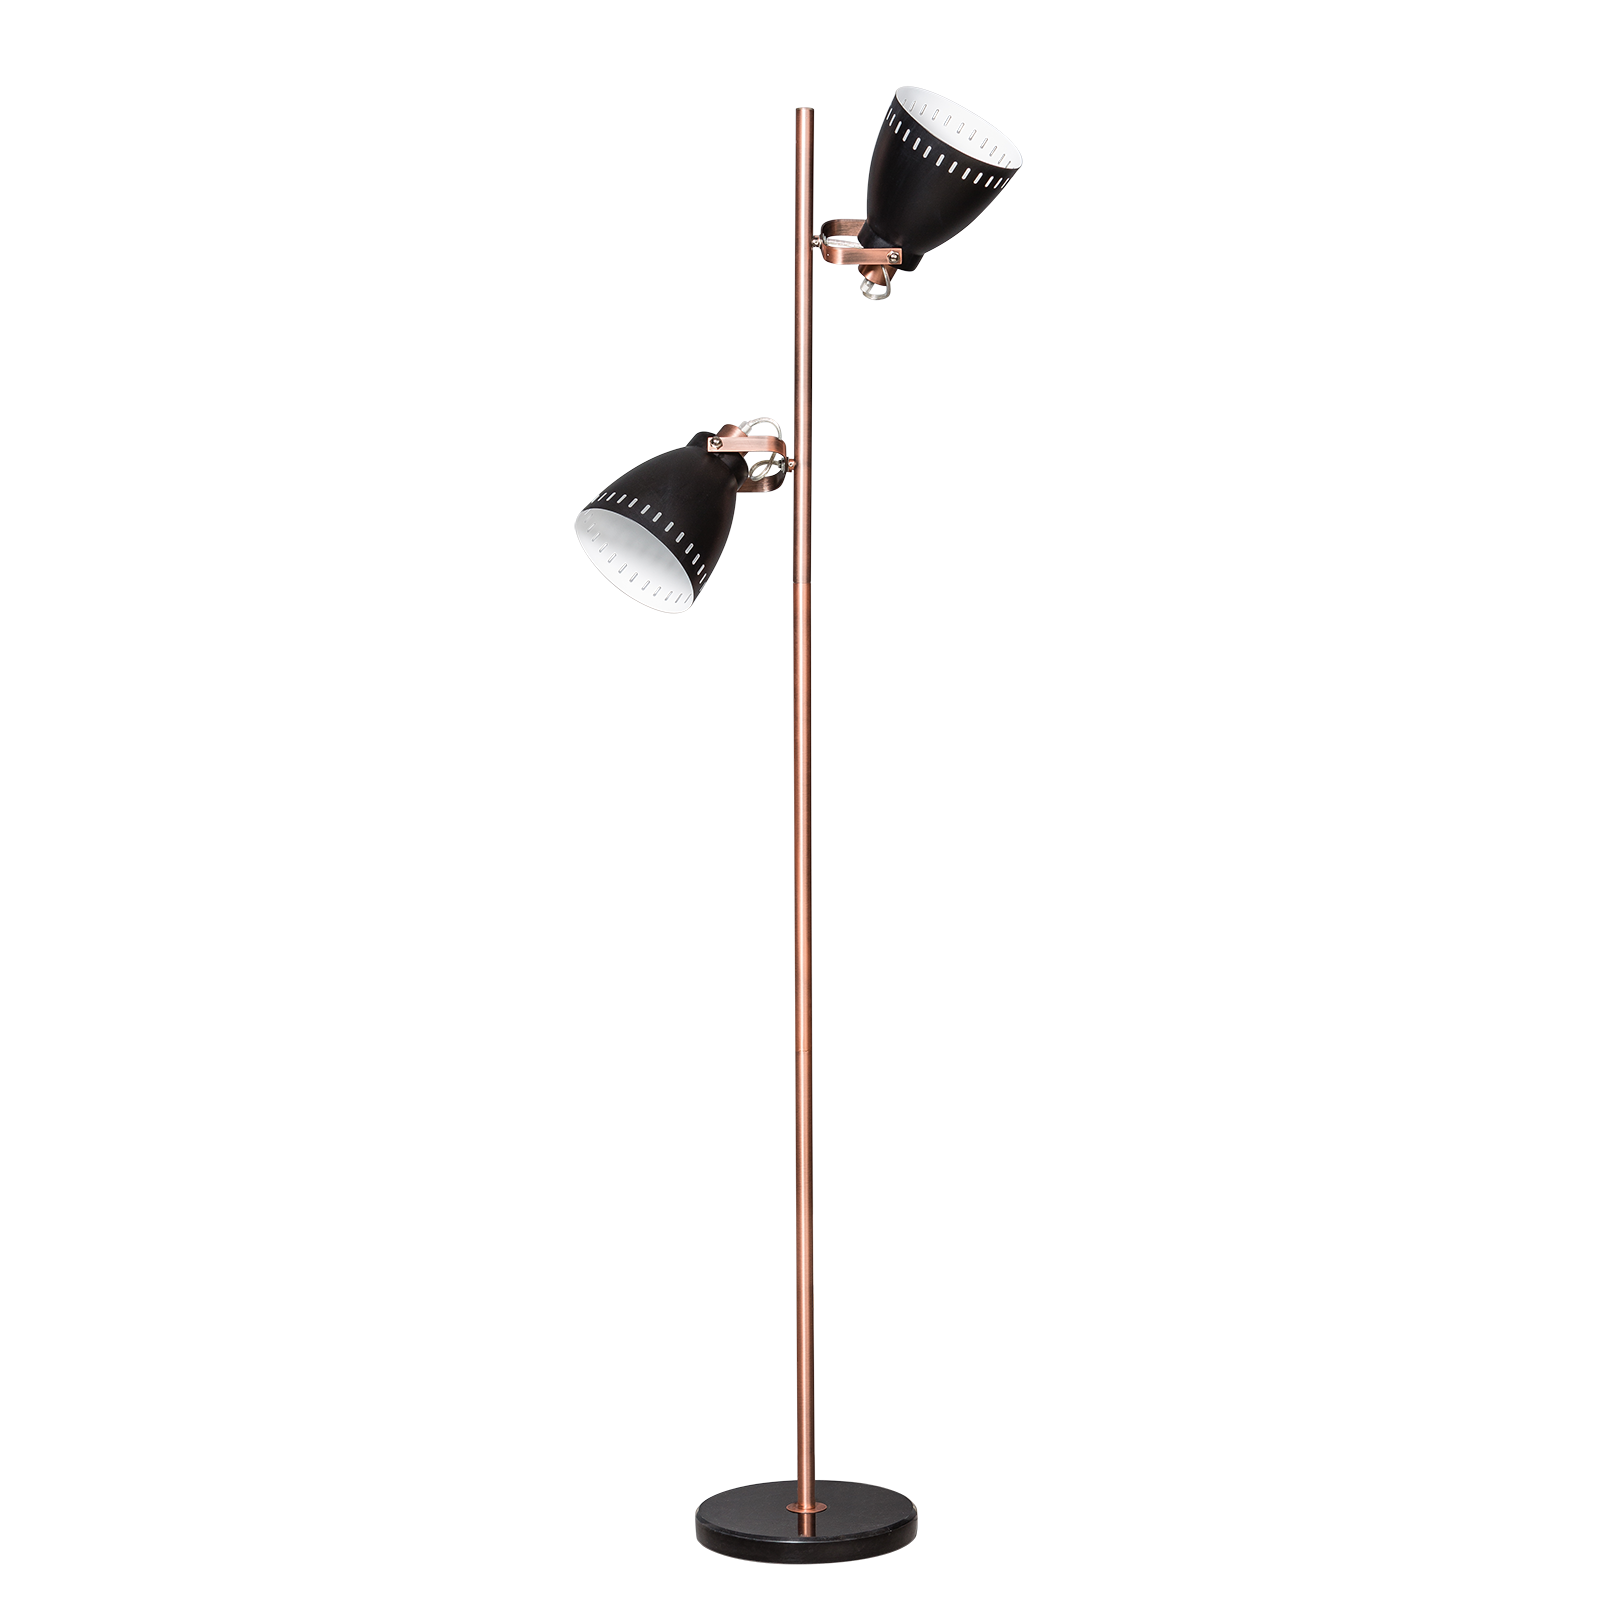 Acate vloerlamp ETH 2x zwart/koper